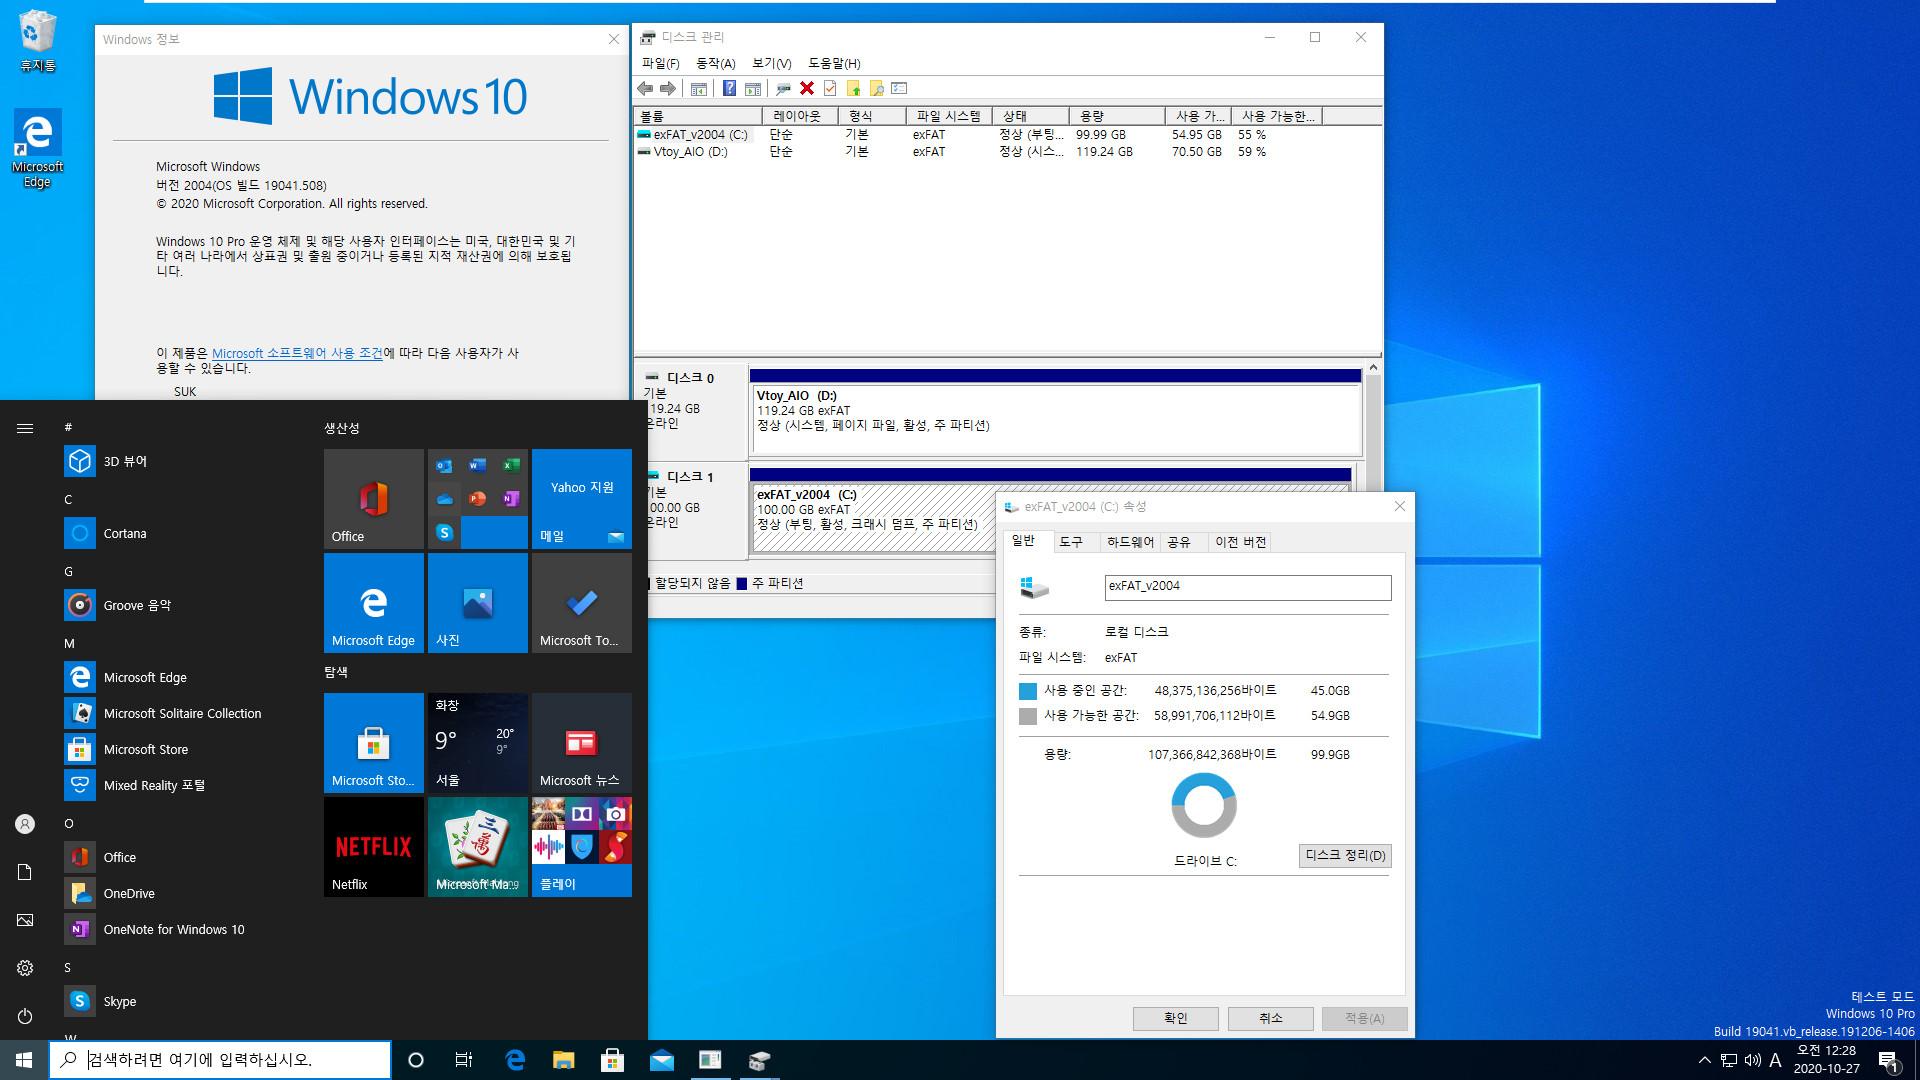 exFAT 포맷으로도 VHD 부팅이 Windows 10 버전 1903부터 된다고 하여 테스트 - 생고생만 하다가 컴퓨터 먹통 2번이나 되고 그만뒀습니다 2020-10-27_002836.jpg